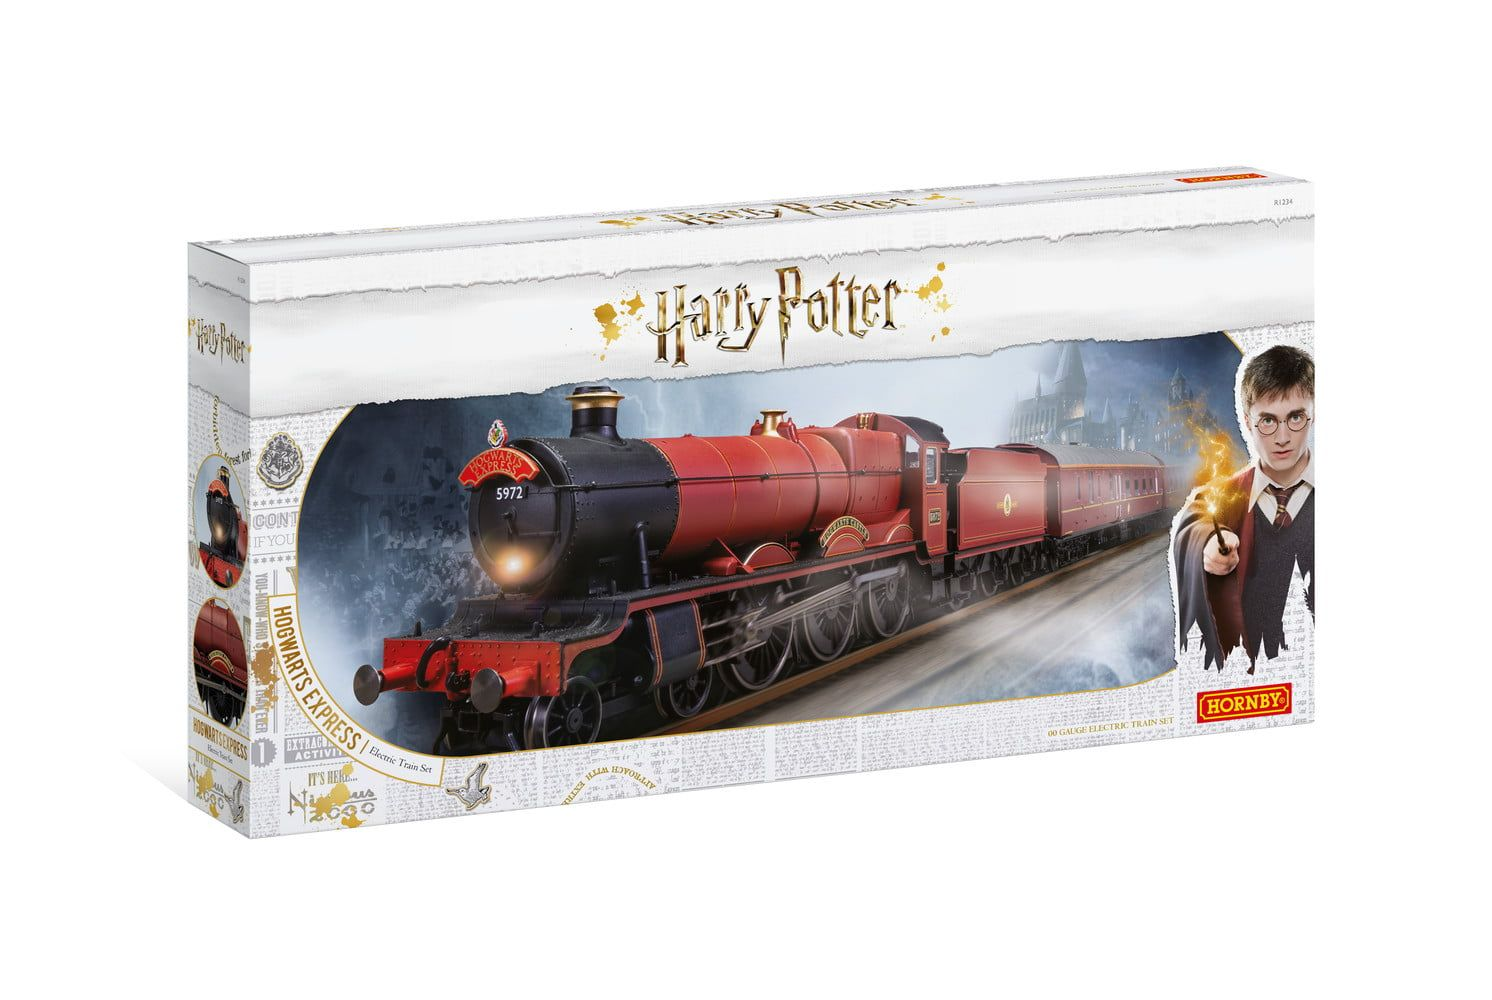 Hogwarts Express' Analogue Train Set